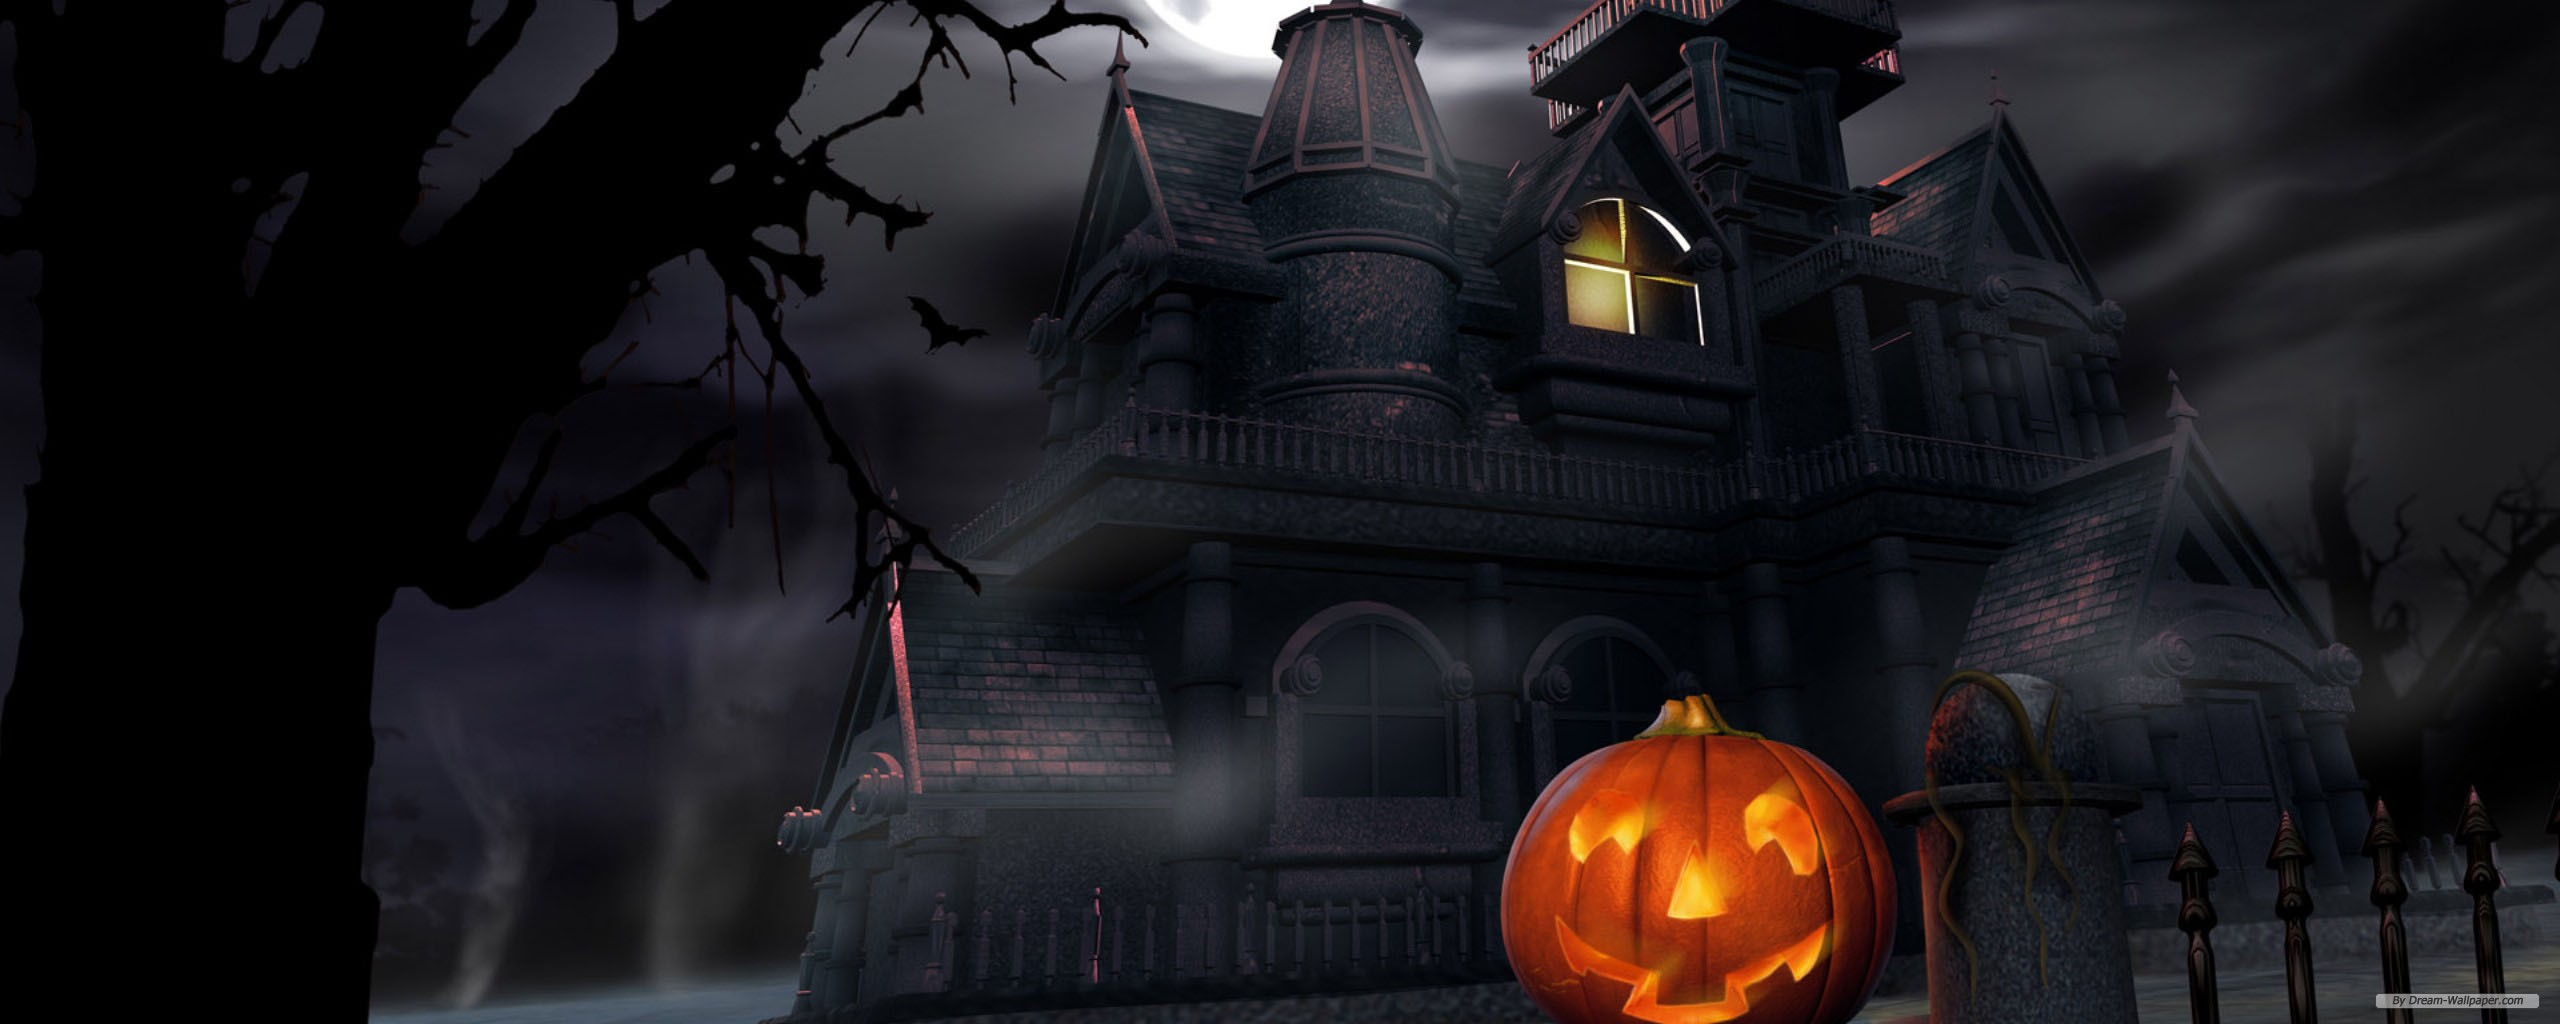 Holiday wallpaper   Halloween Episode 7 wallpaper   dual screen 2560x1024